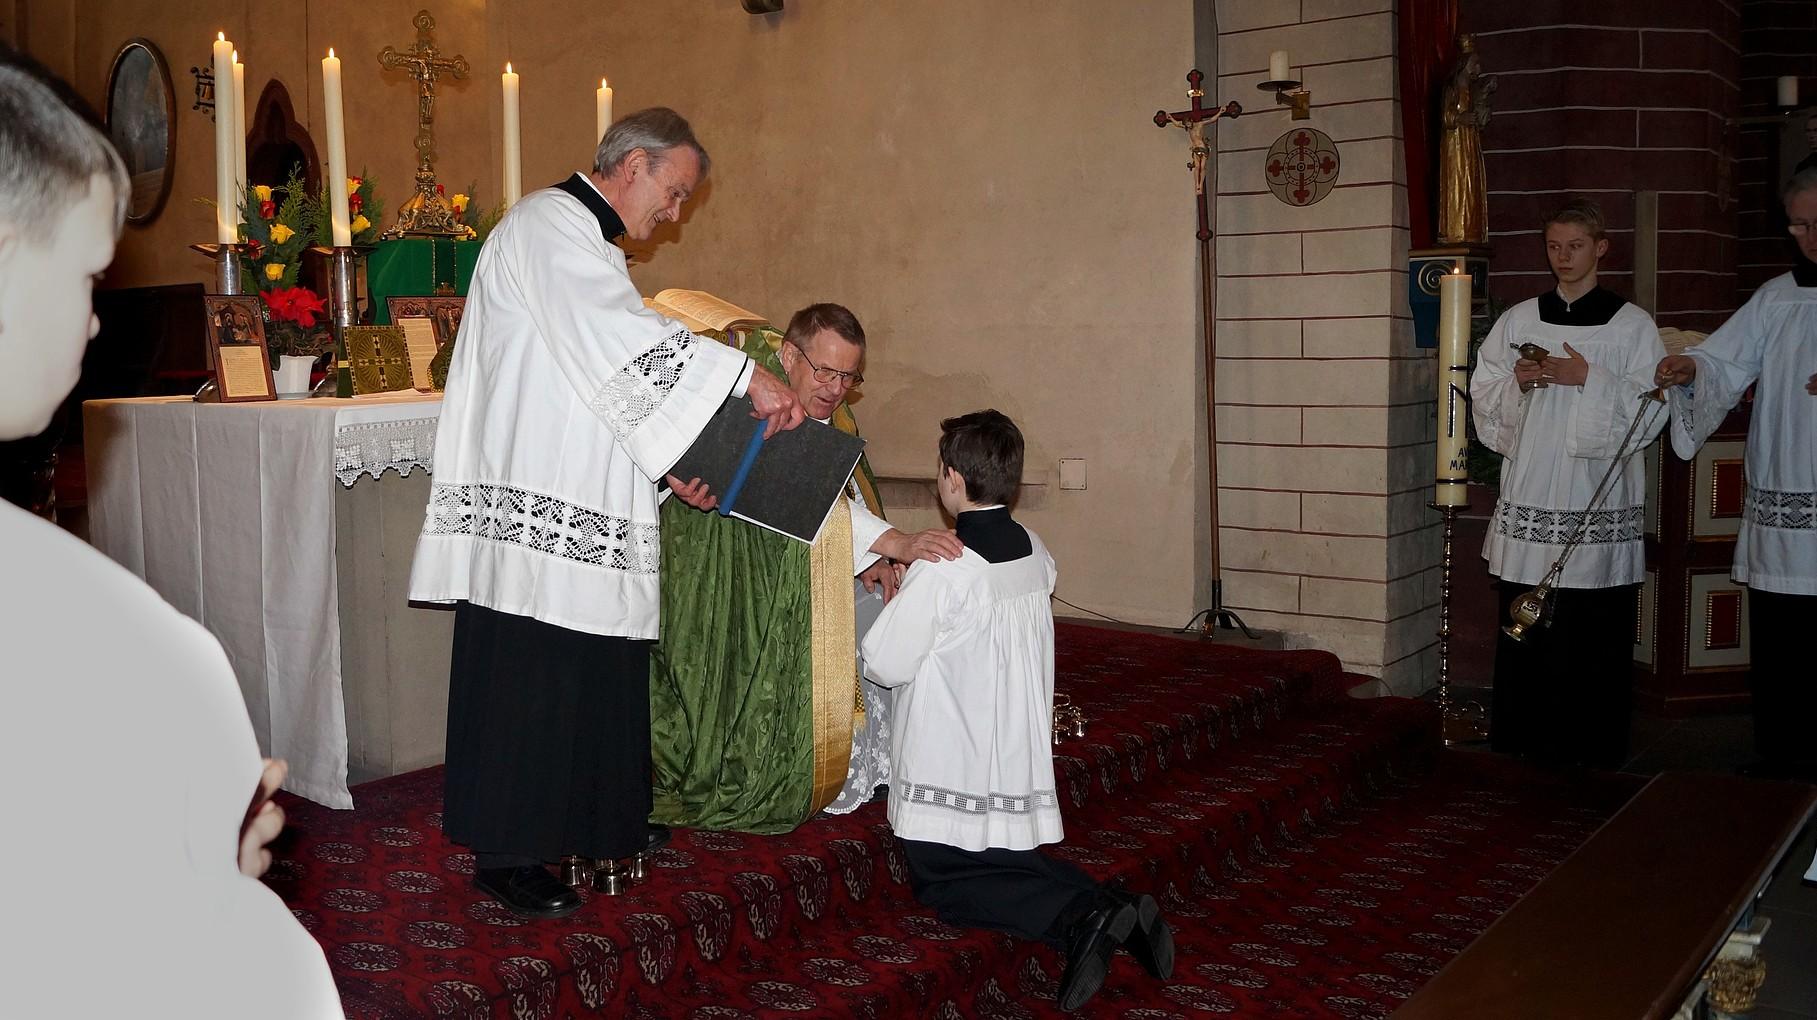 Ministrantenaufnahme - Alte Messe Paderborn